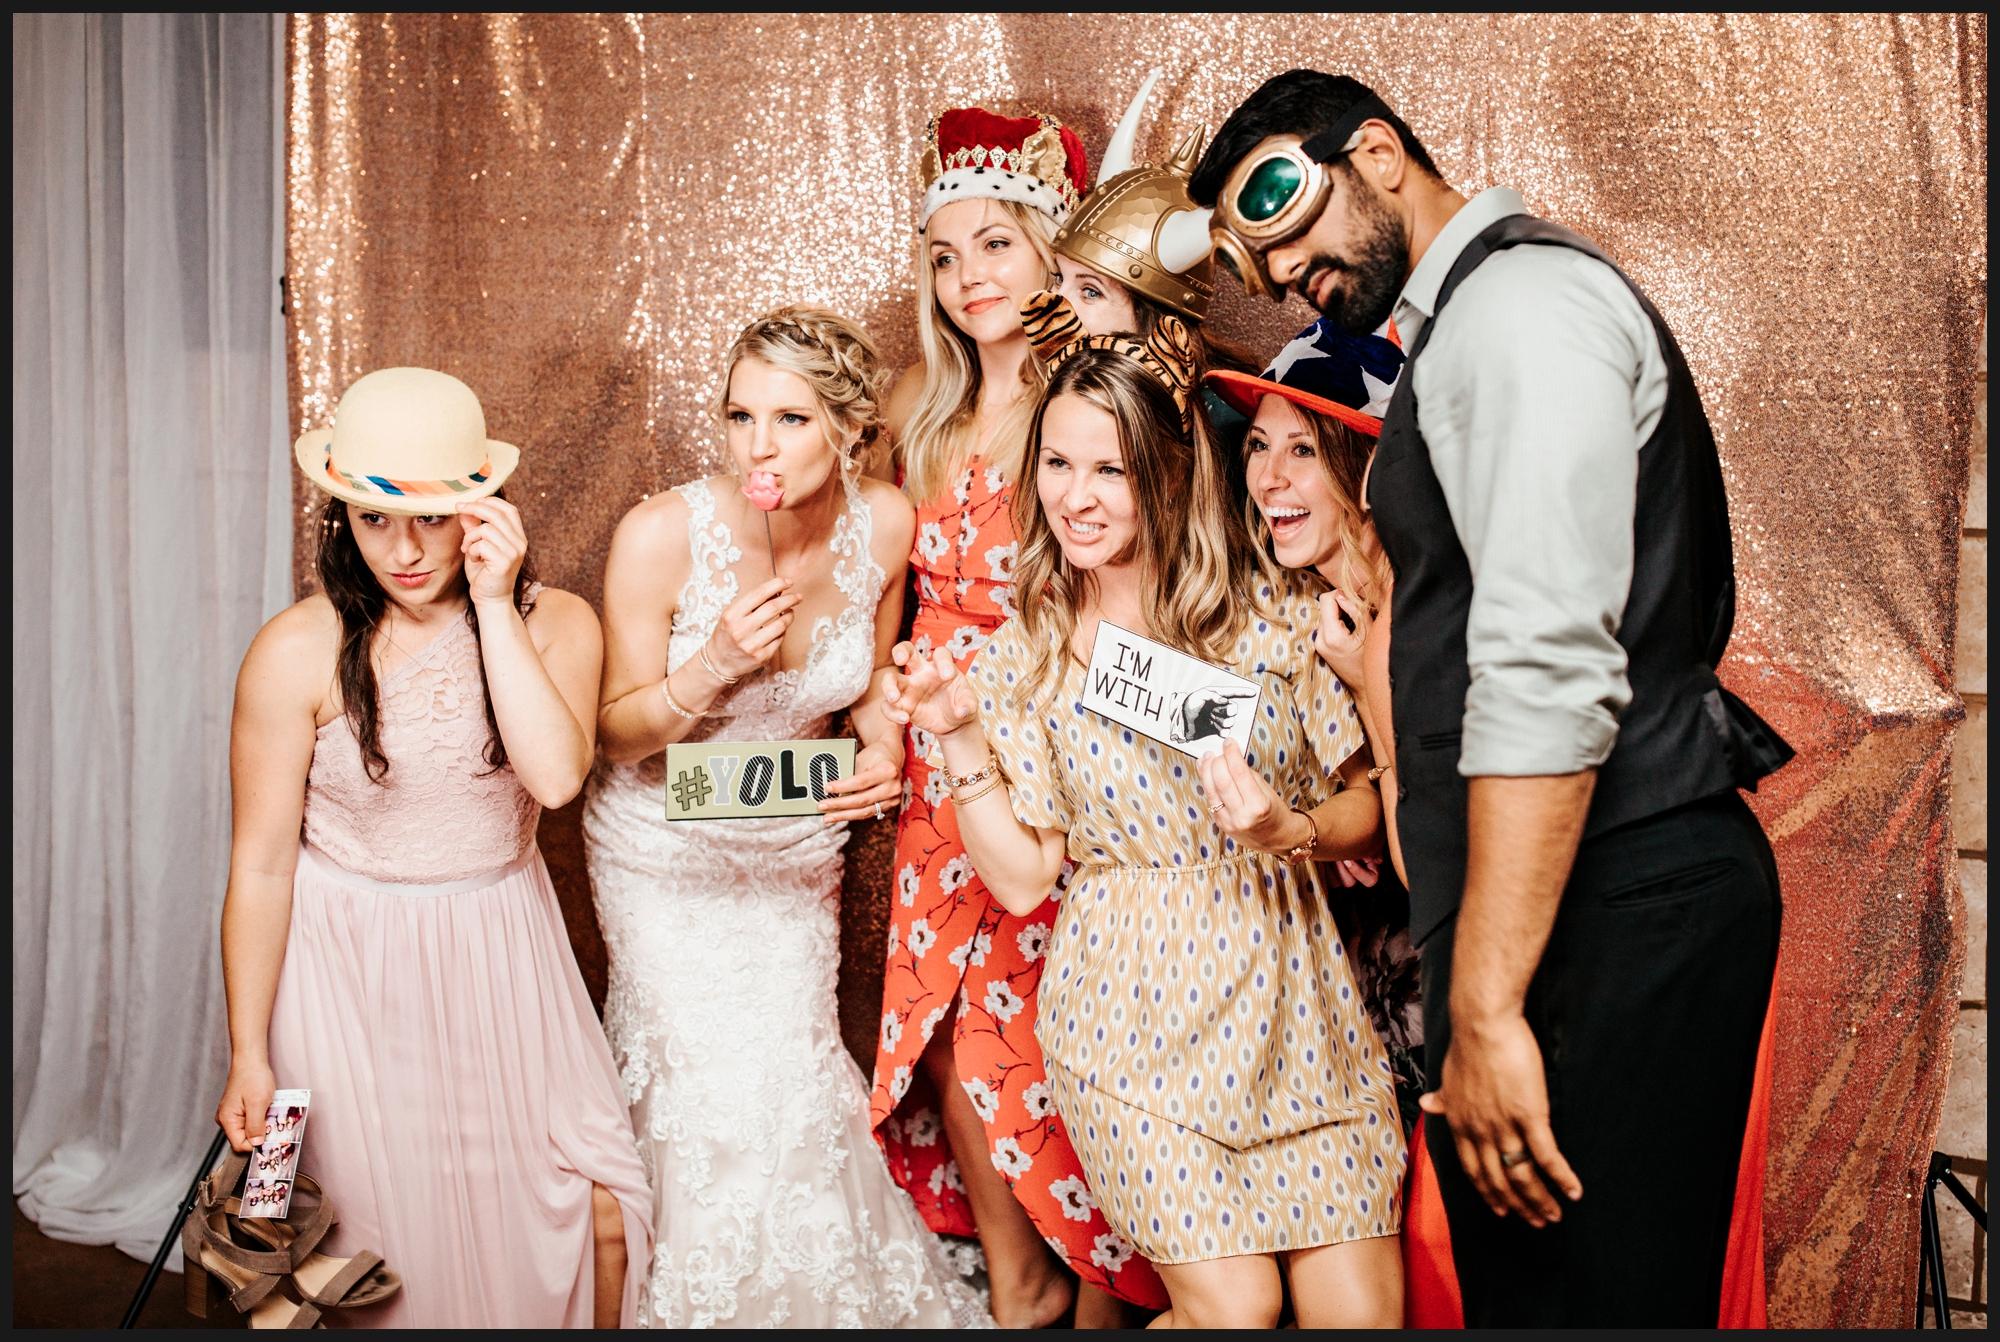 Orlando-Wedding-Photographer-destination-wedding-photographer-florida-wedding-photographer-hawaii-wedding-photographer_0623.jpg